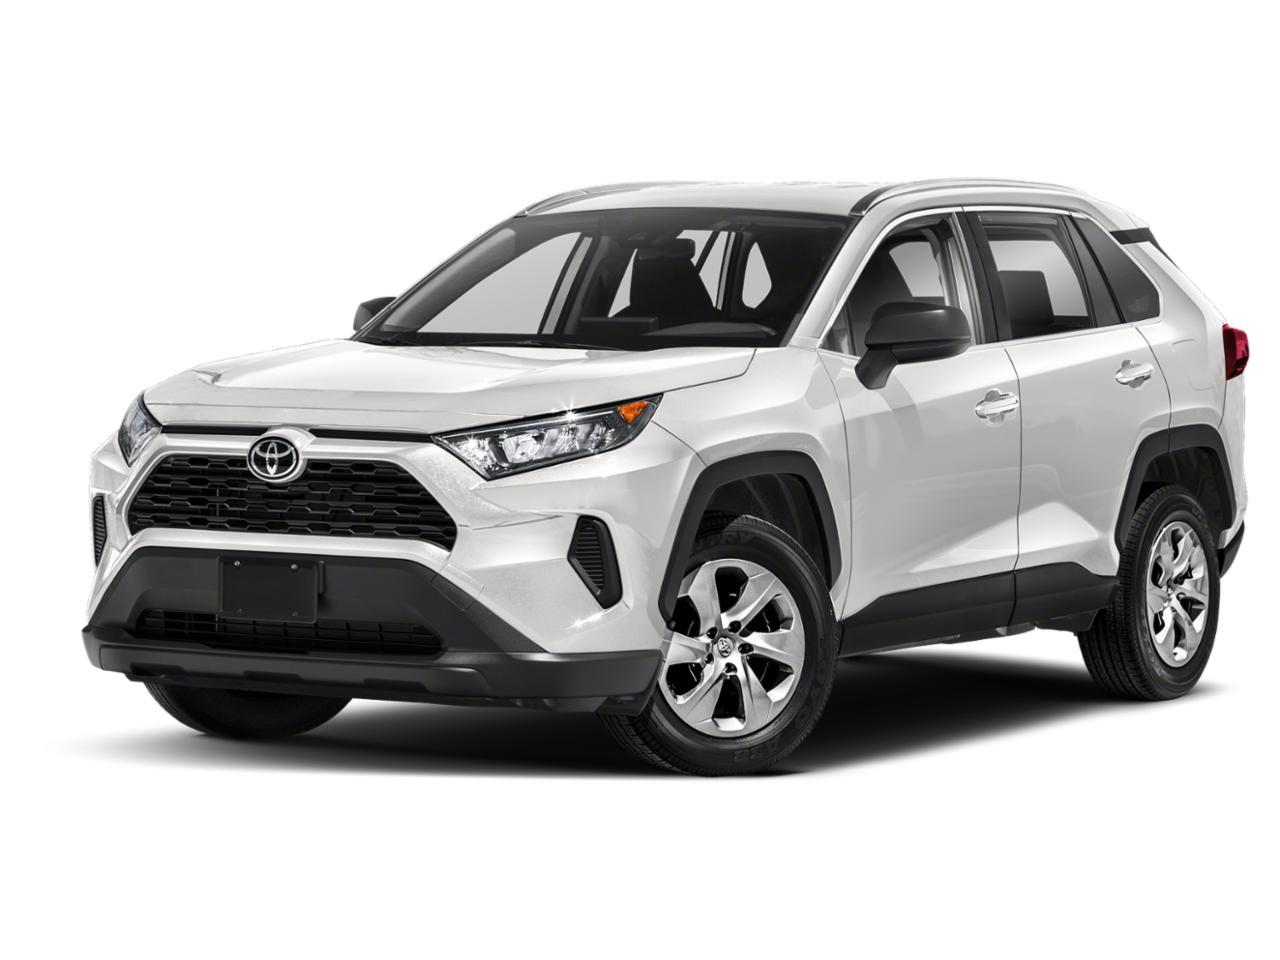 2021 Toyota RAV4 Vehicle Photo in Owensboro, KY 42301